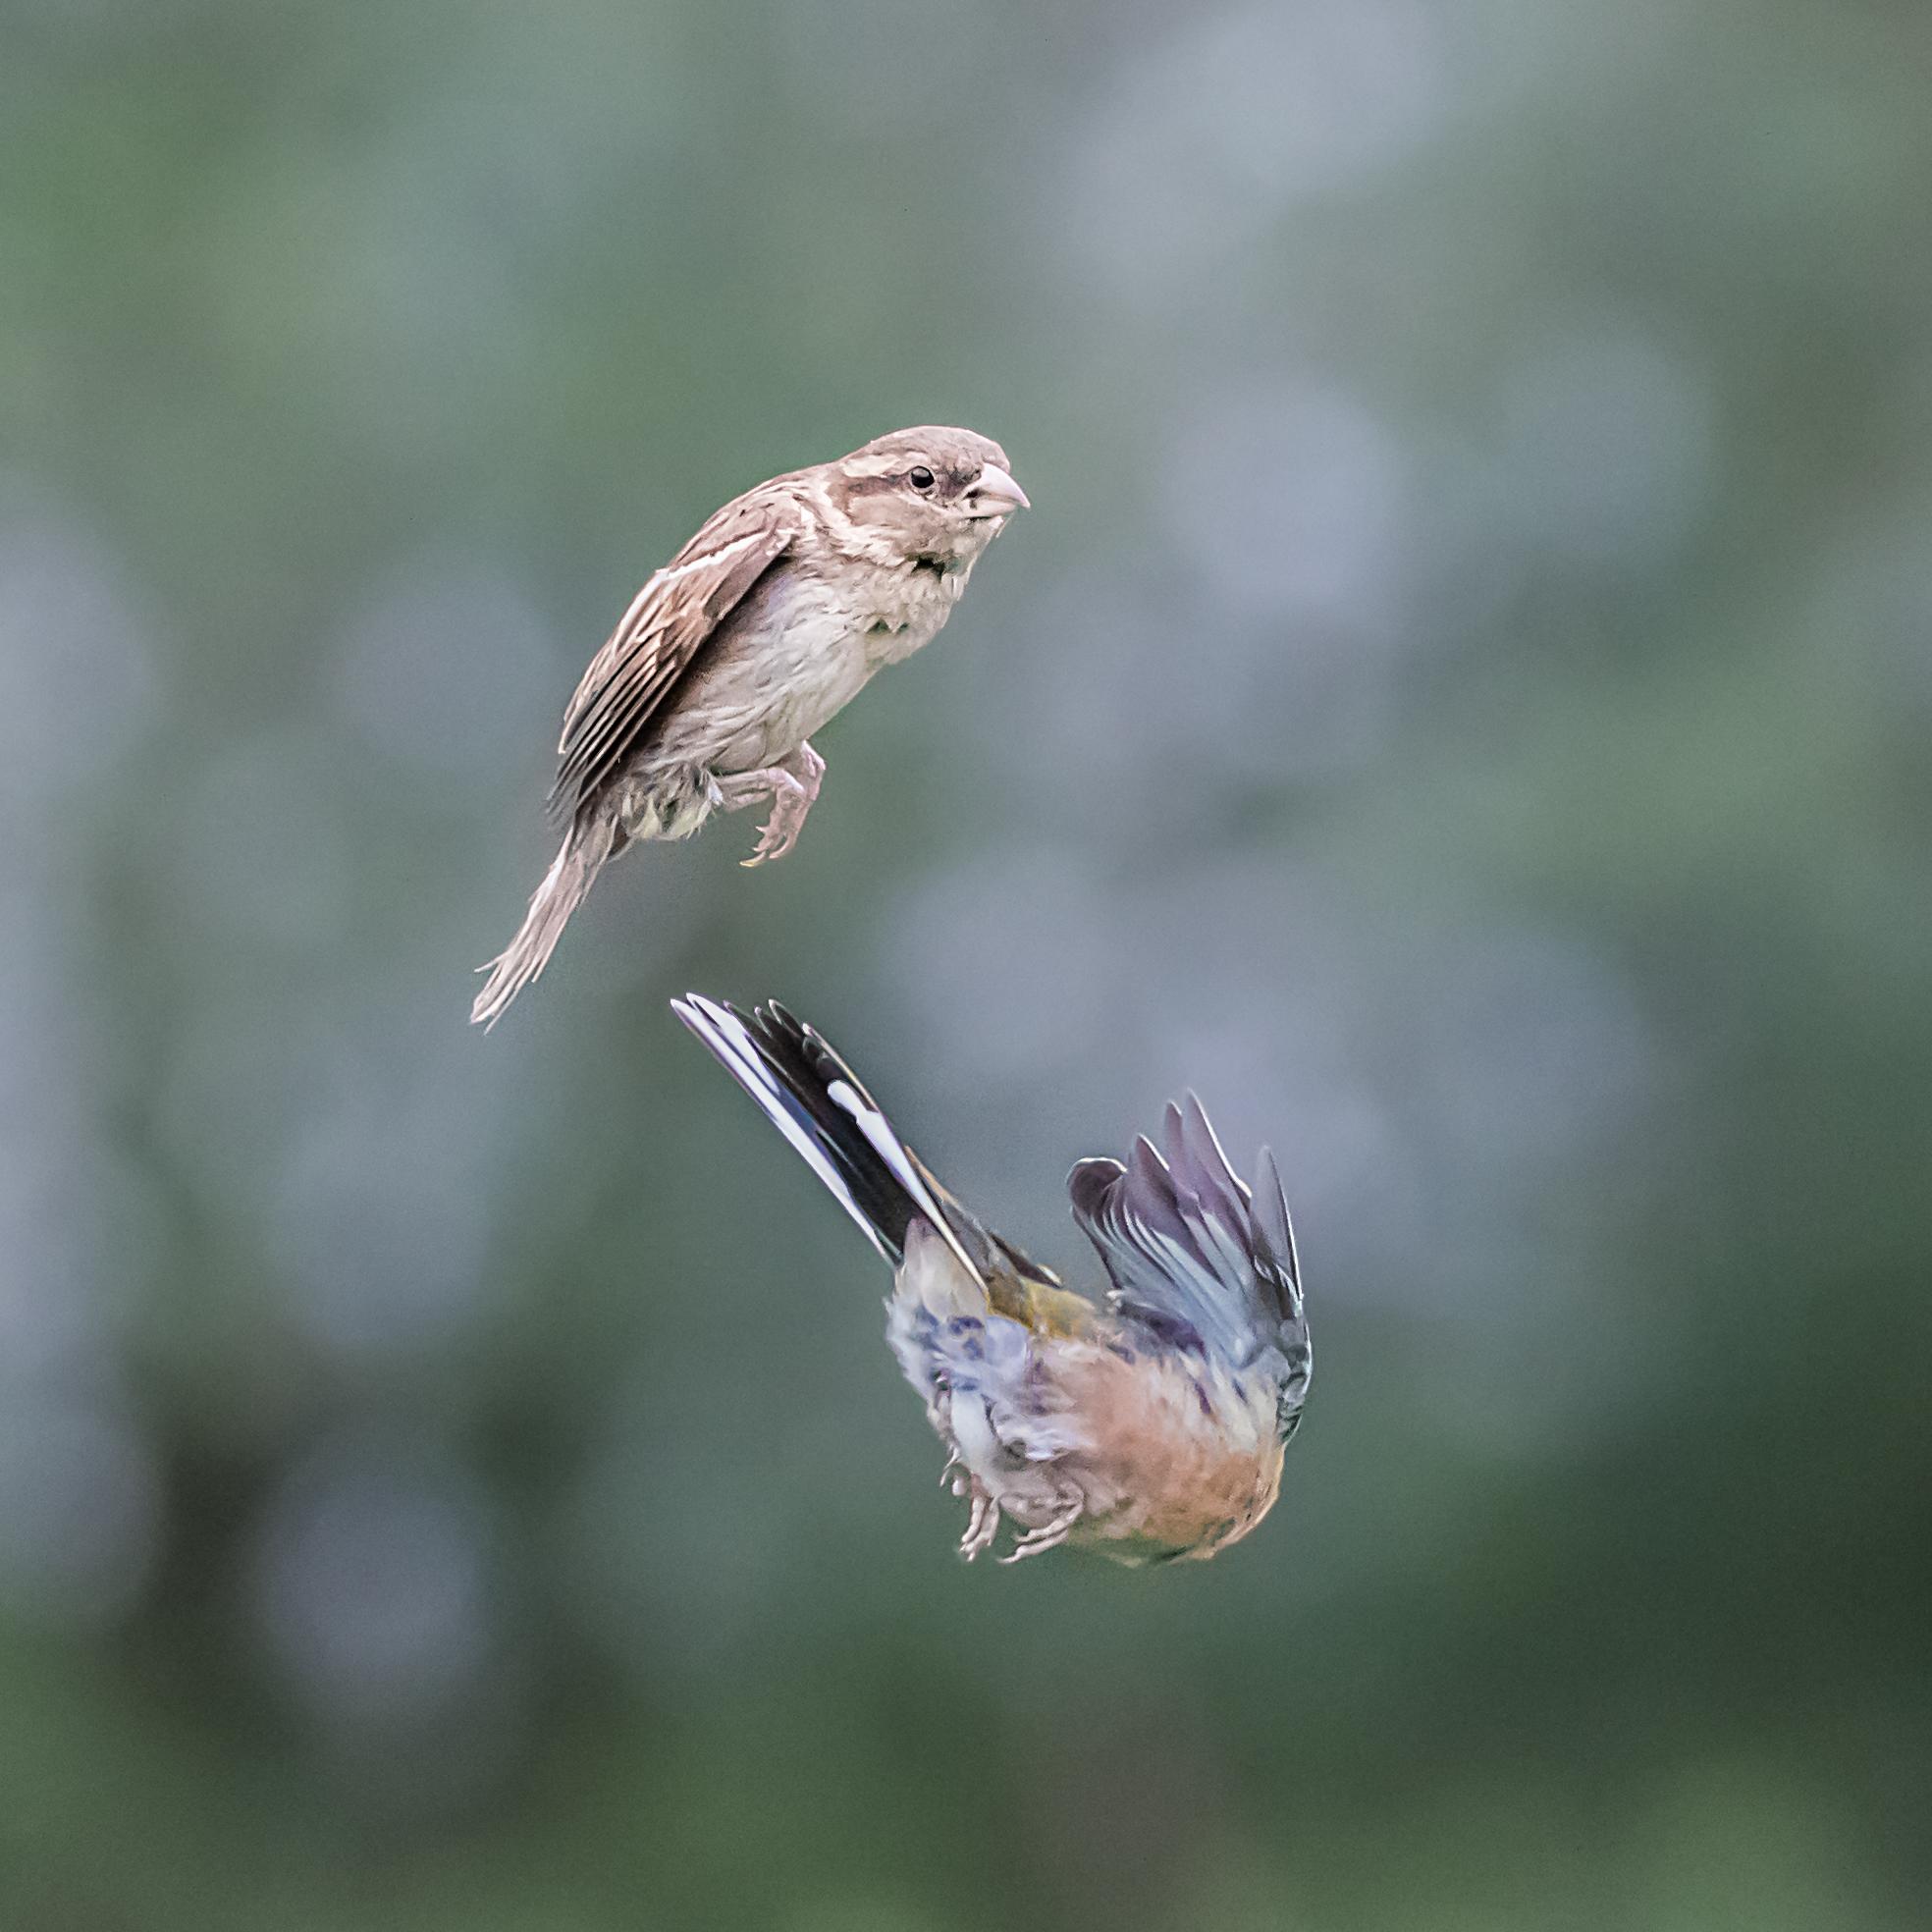 Sparrow avoiding a Chaffinch!